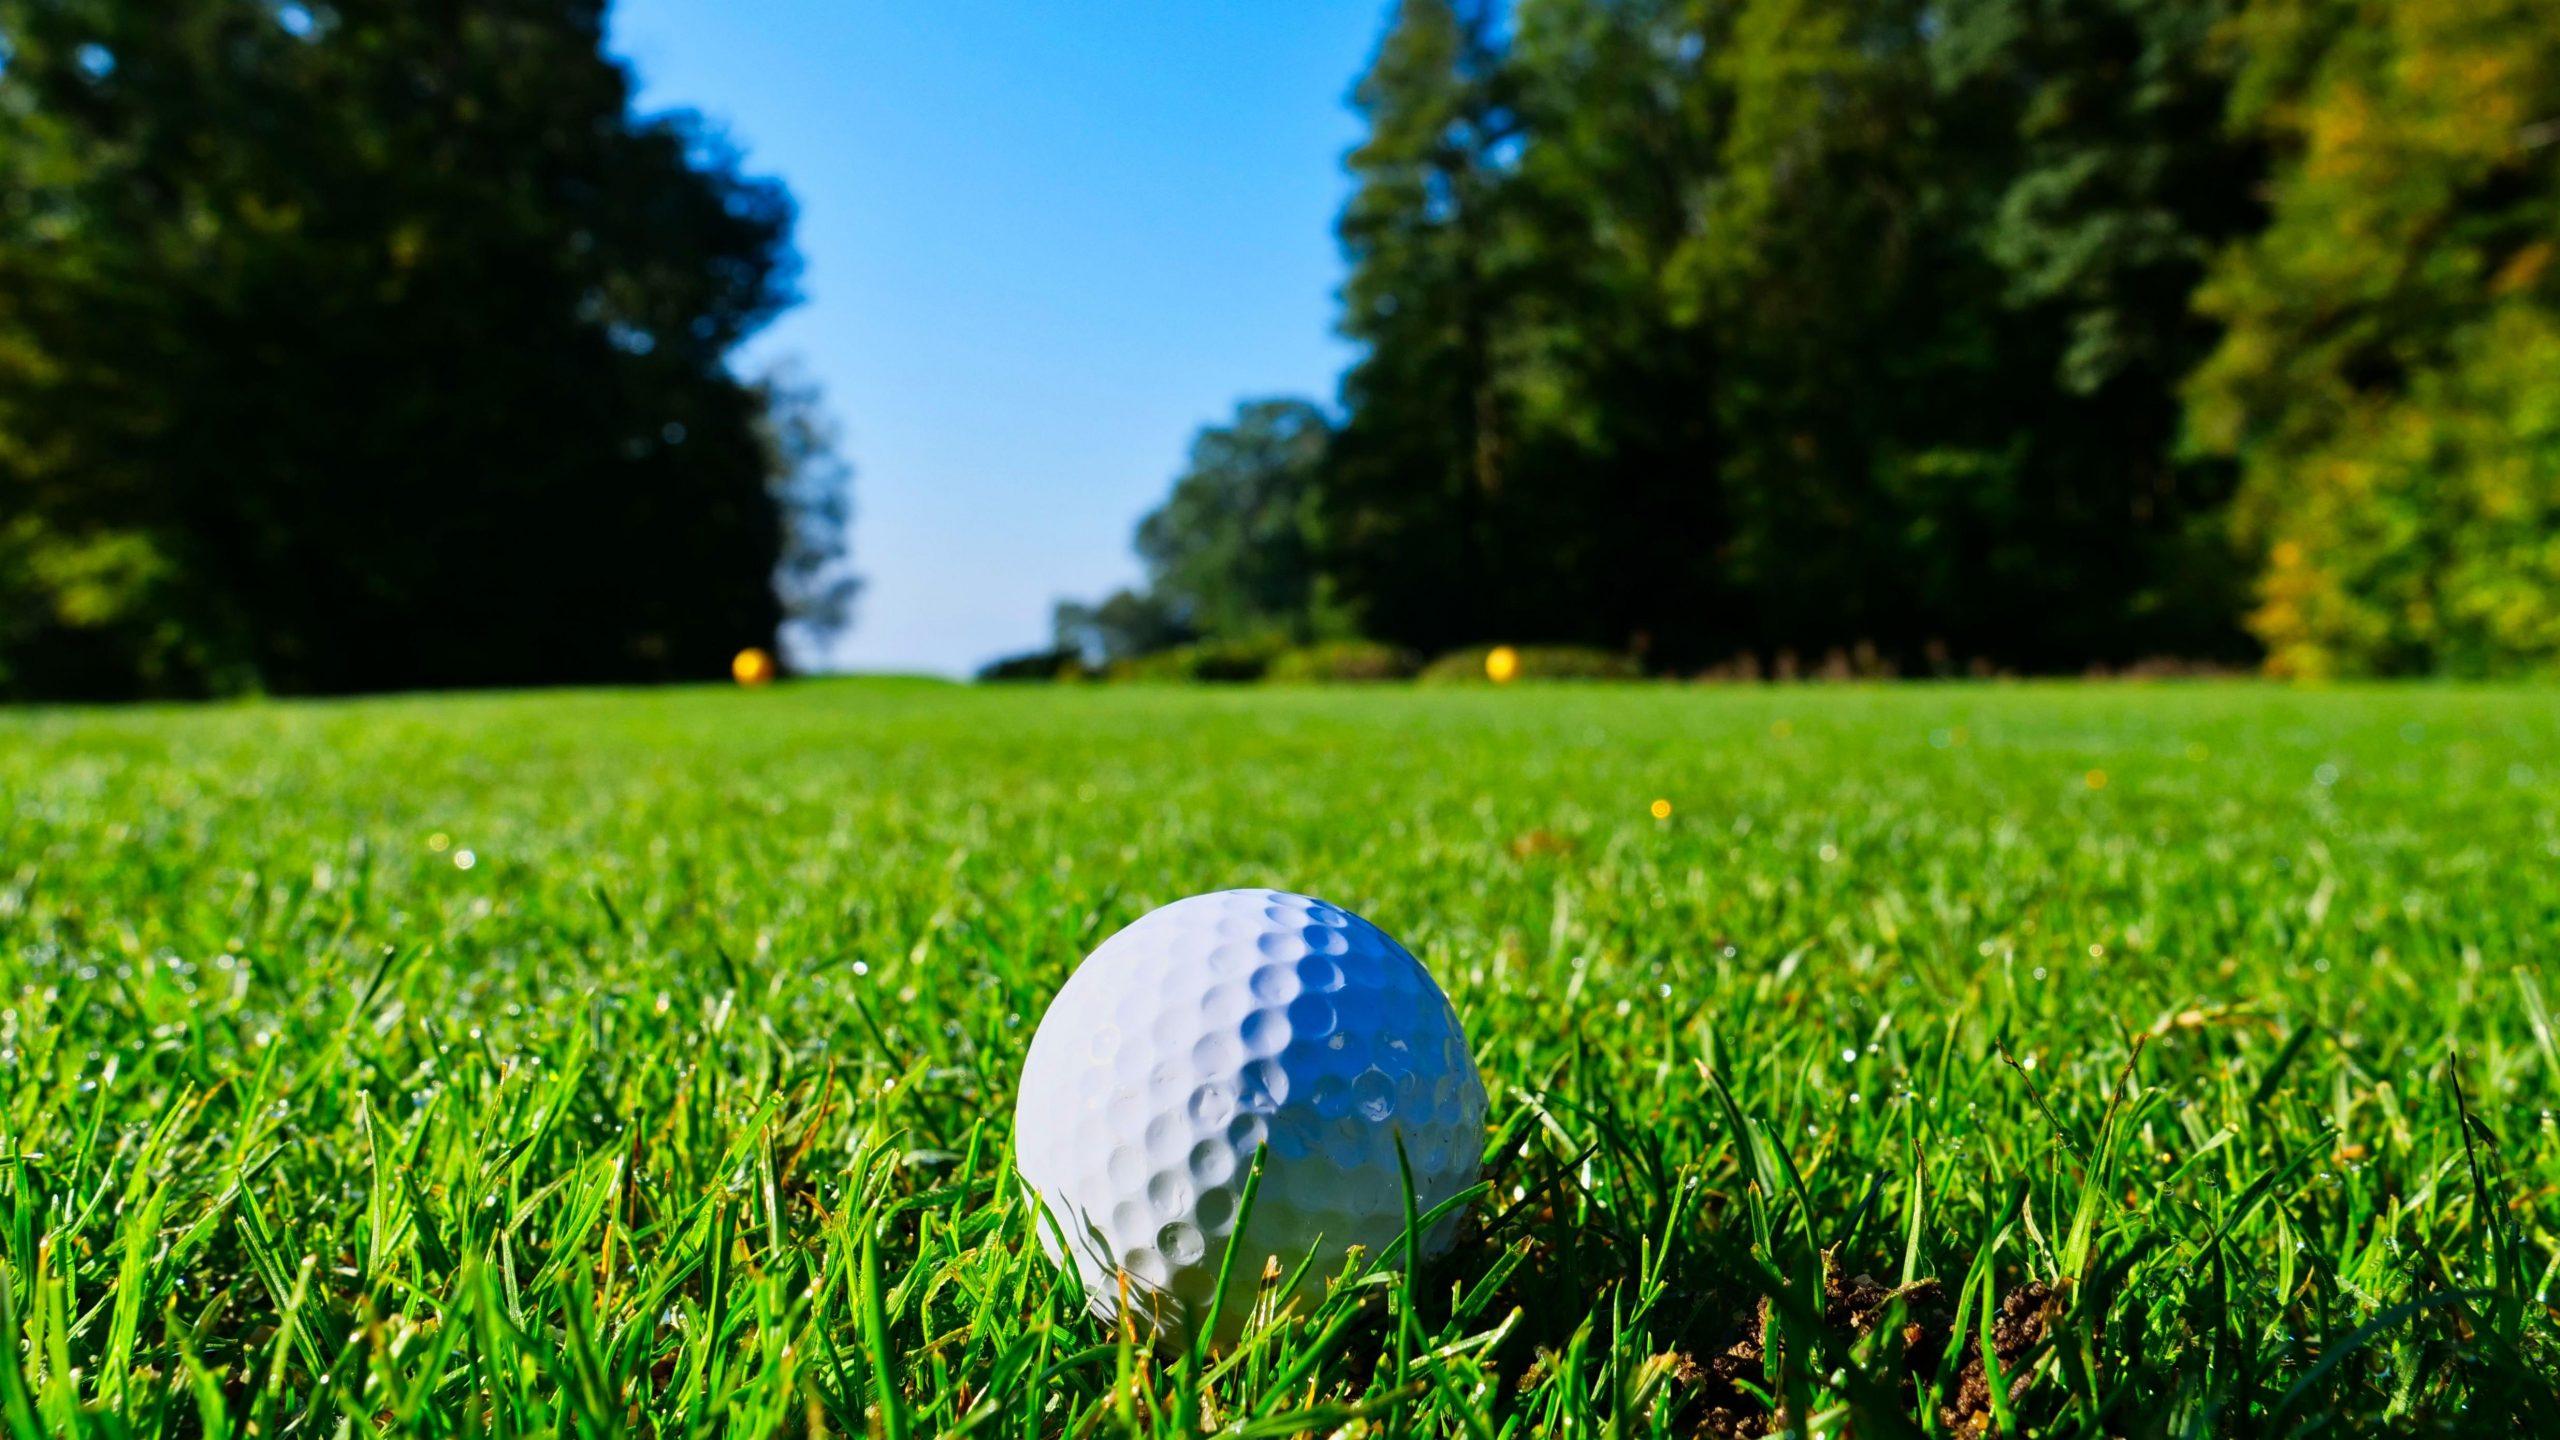 Bloch Memorial Golf Course photo